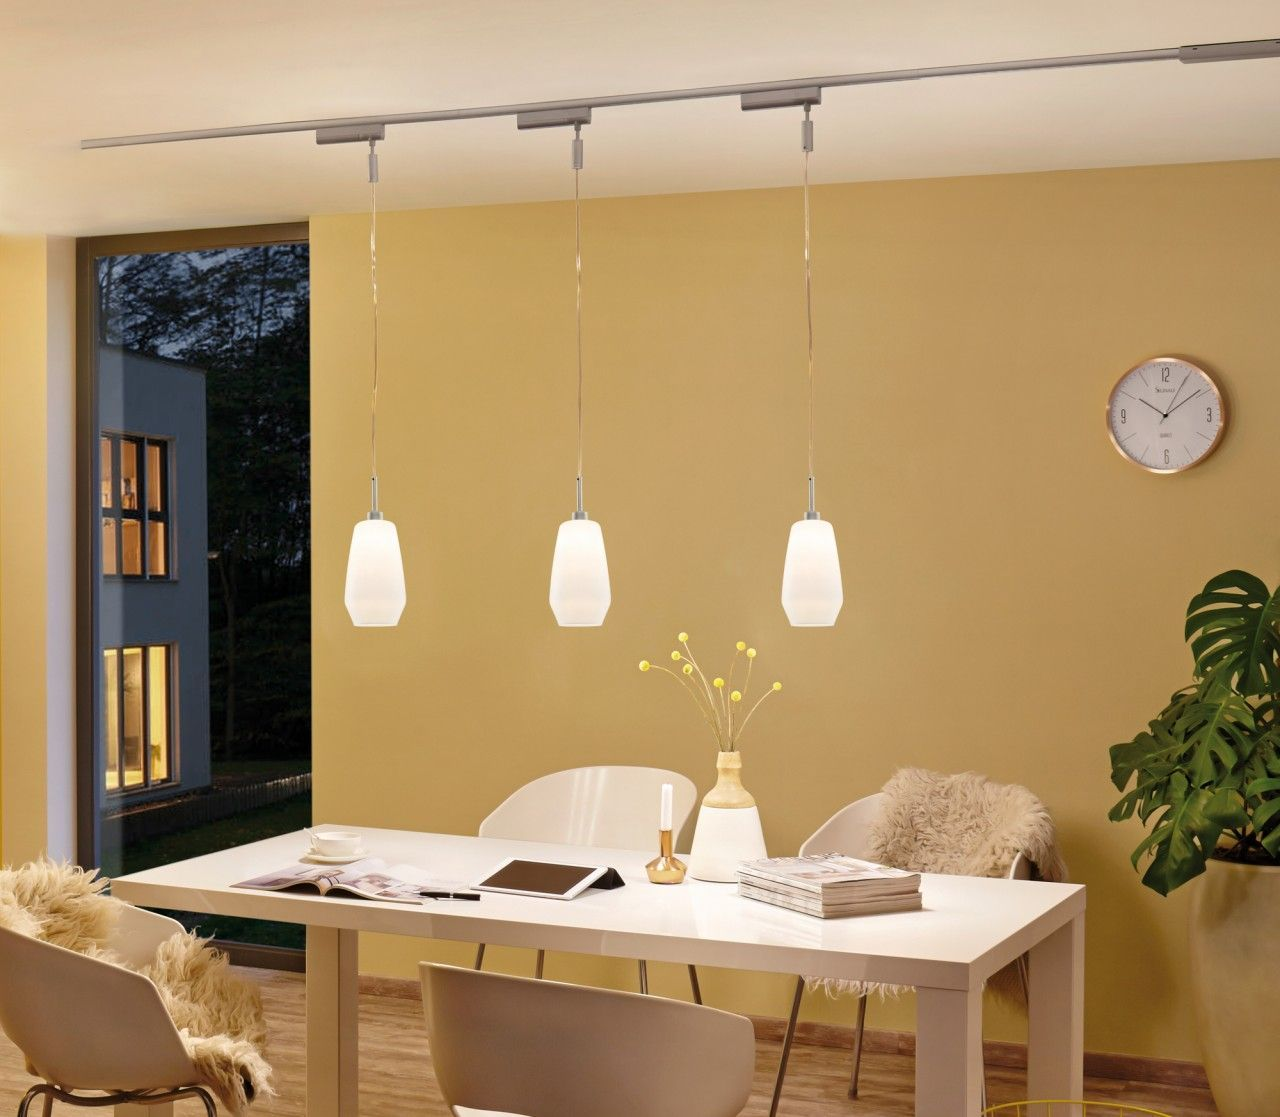 Die Richtige Beleuchtung Fur Den Esstisch Mit Dem Lampen System Von Paulmann Bist Du Komplett Flexibe Living Room Lighting Lamps Living Room Cheap Table Lamps